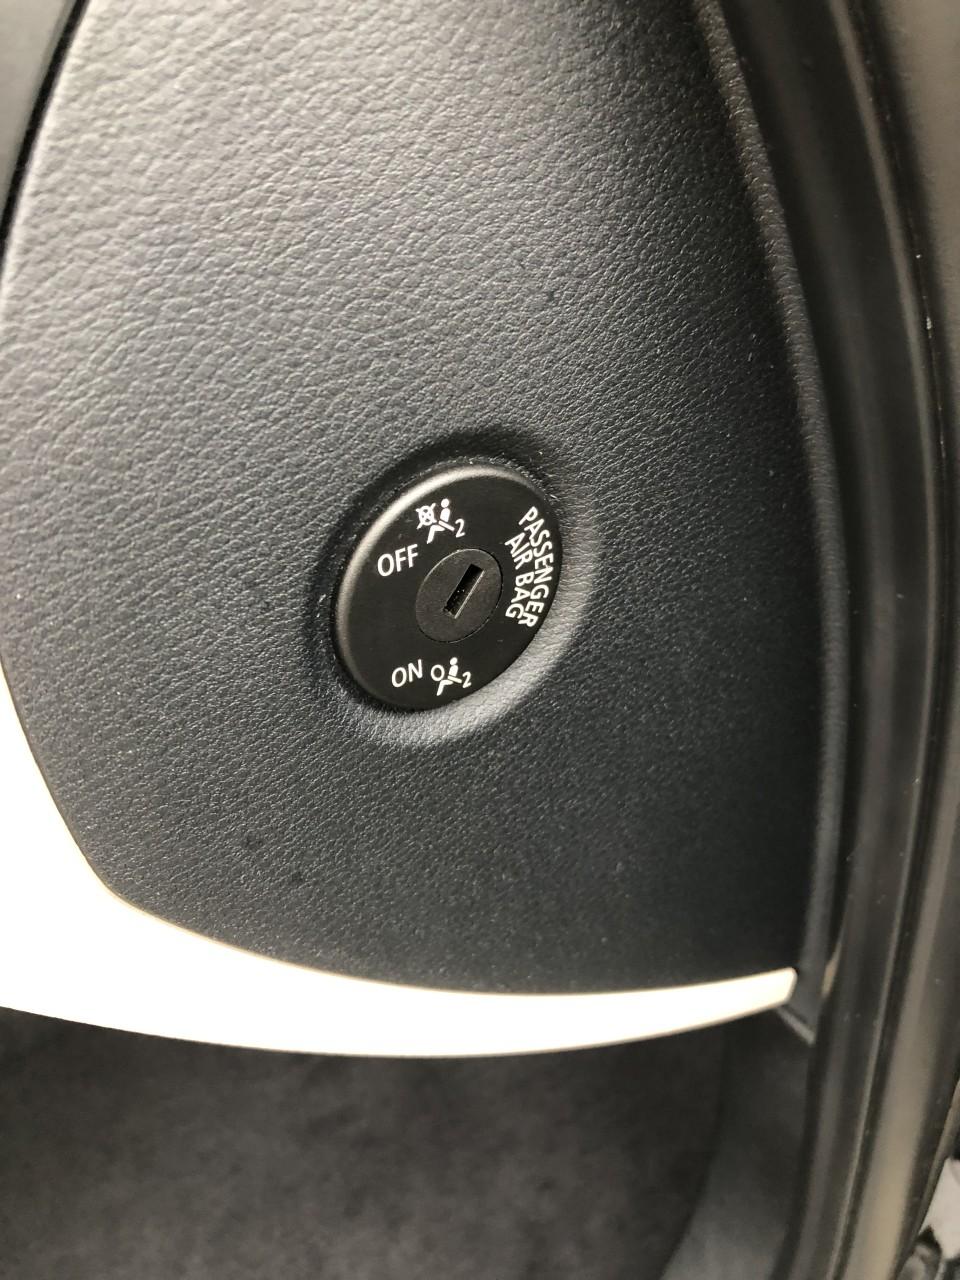 BMW X1 BMW X1 2.0d xDrive 177Cp XLine Automata / Navigatie / Bi-xenon / Piele / Pilot / PDC fata+spate / Bluetooth / etc... RECENT ADUSA DIN GERMANIA!!! 2010